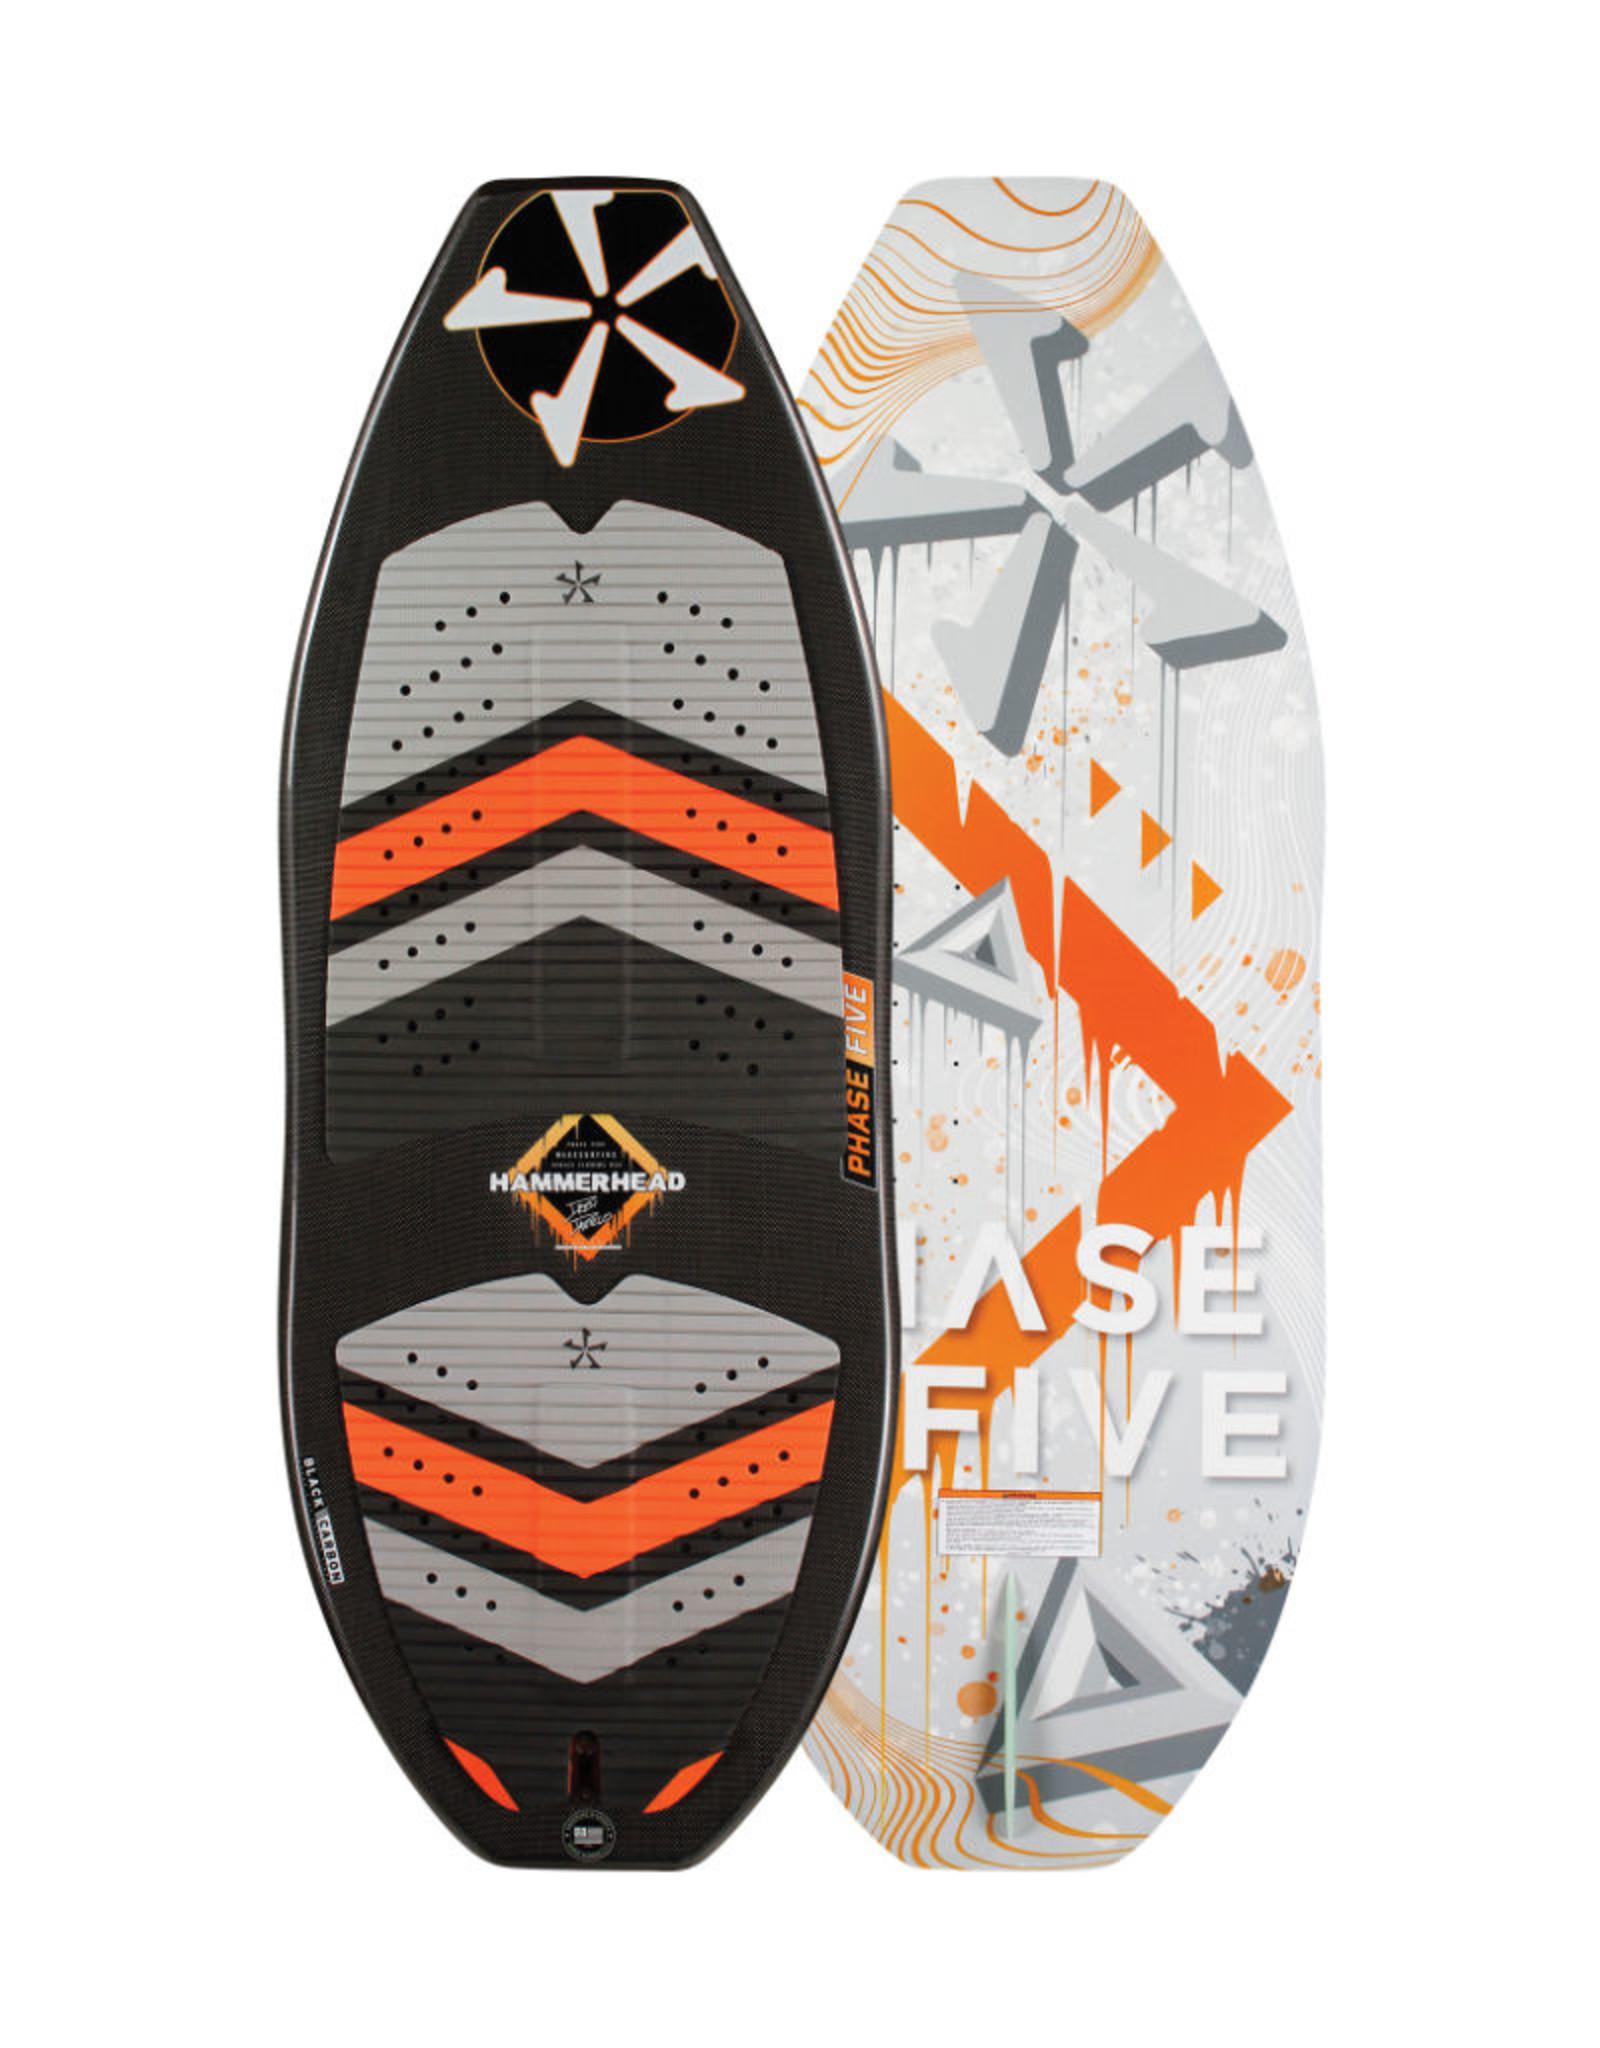 "Phase Five Phase Five Hammerhead 50"" Skim Style Wakesurf"